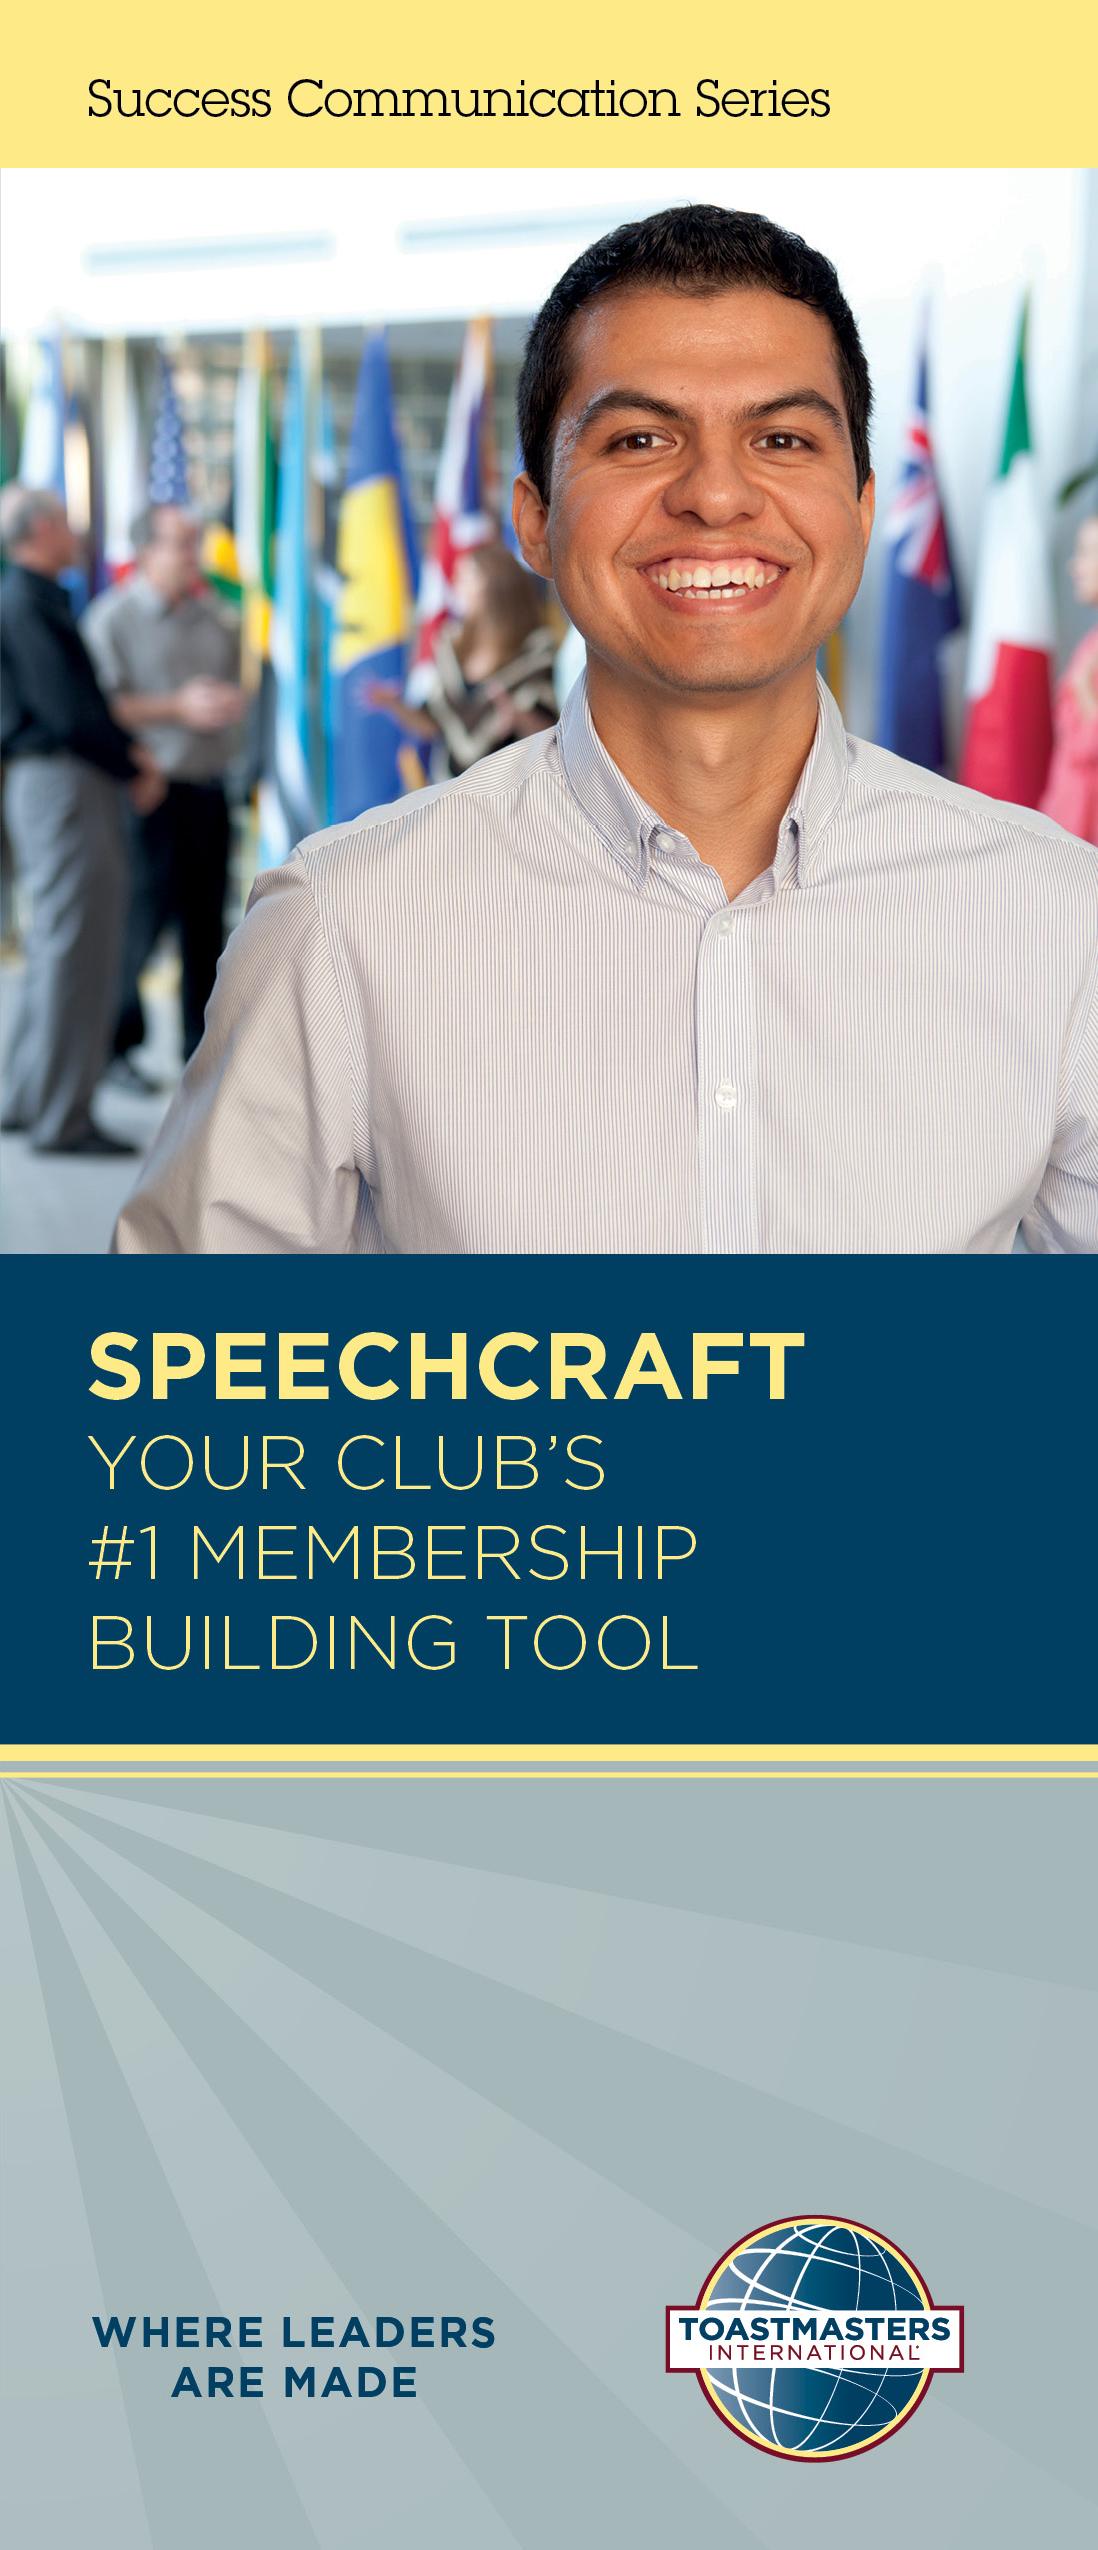 Your Club's #1 Membership Building Tool